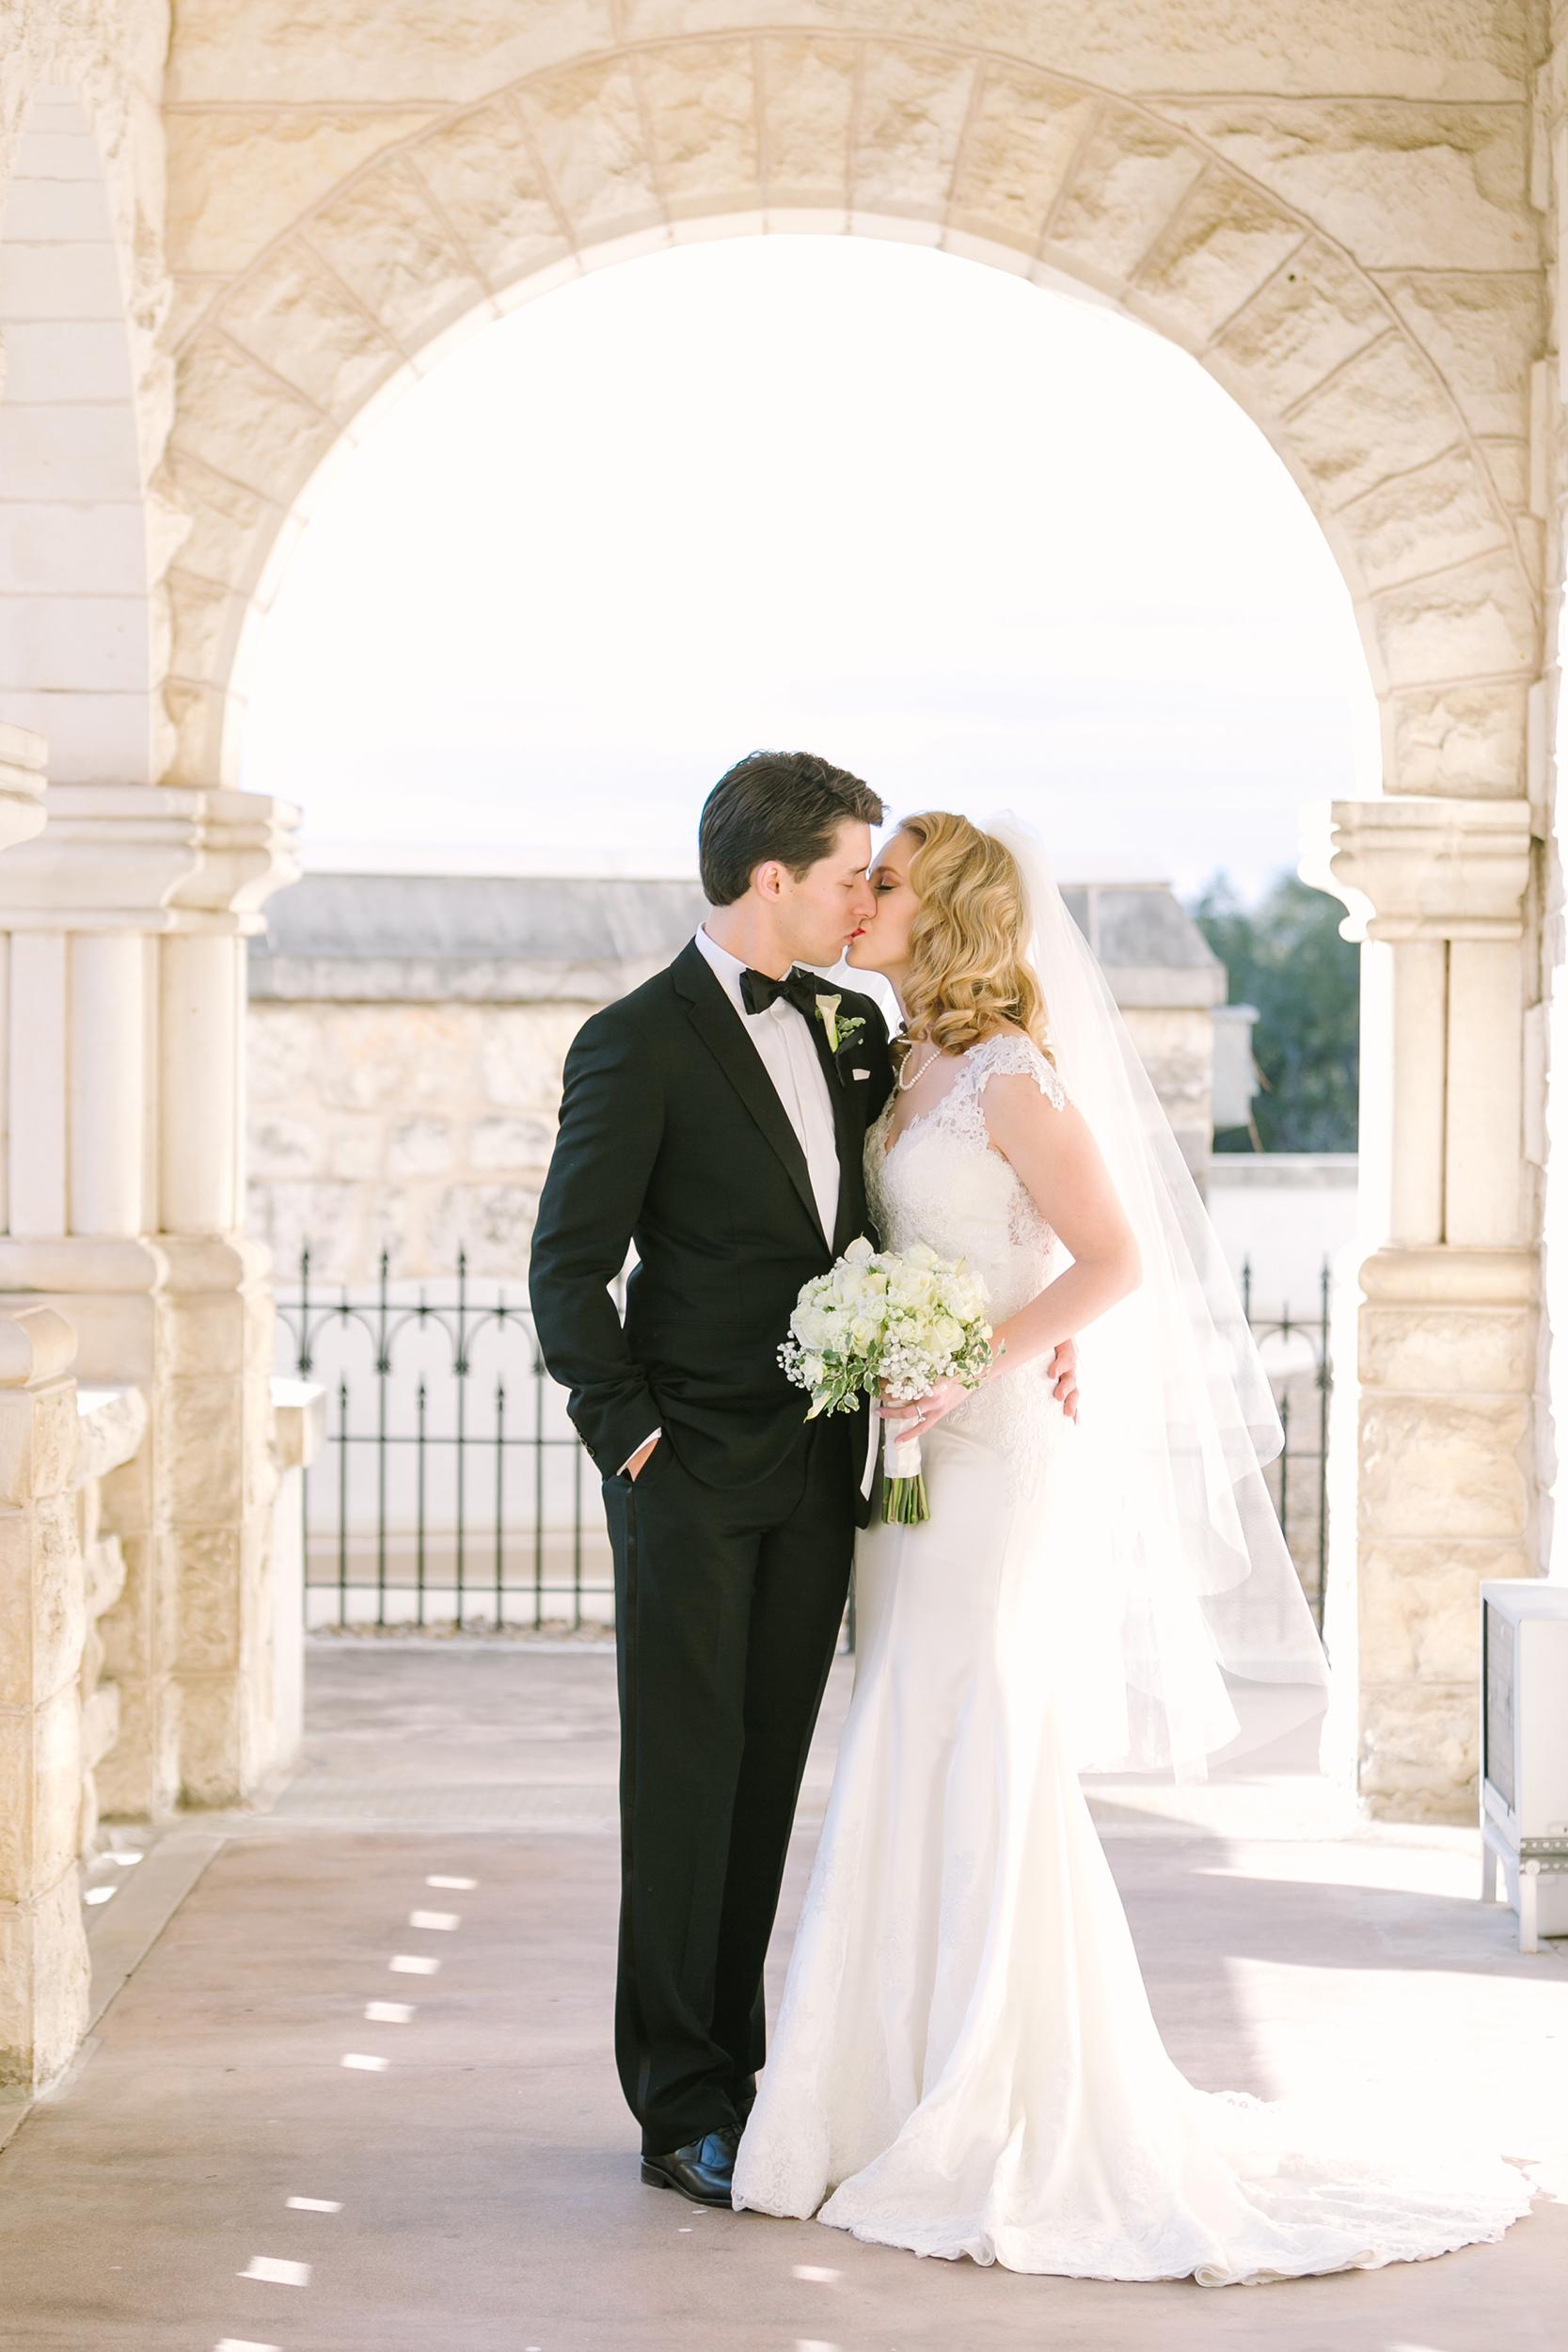 Austin_Wedding_Photographer_Kimberly_Brooke_Photographic_140.jpg